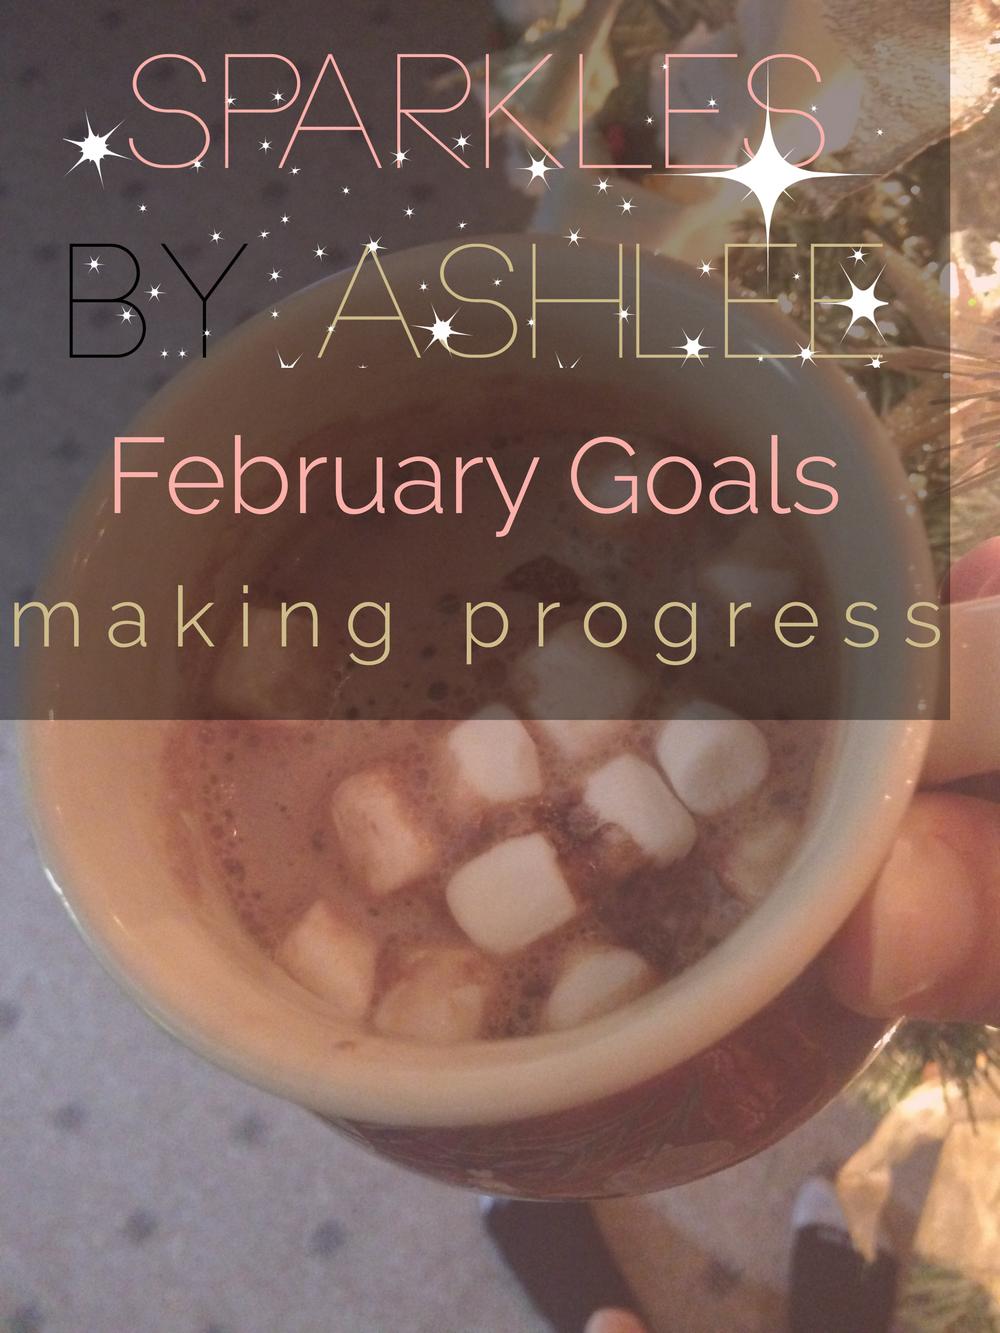 February-Goals-Making-Progress-Sparkles-by-Ashlee.jpg